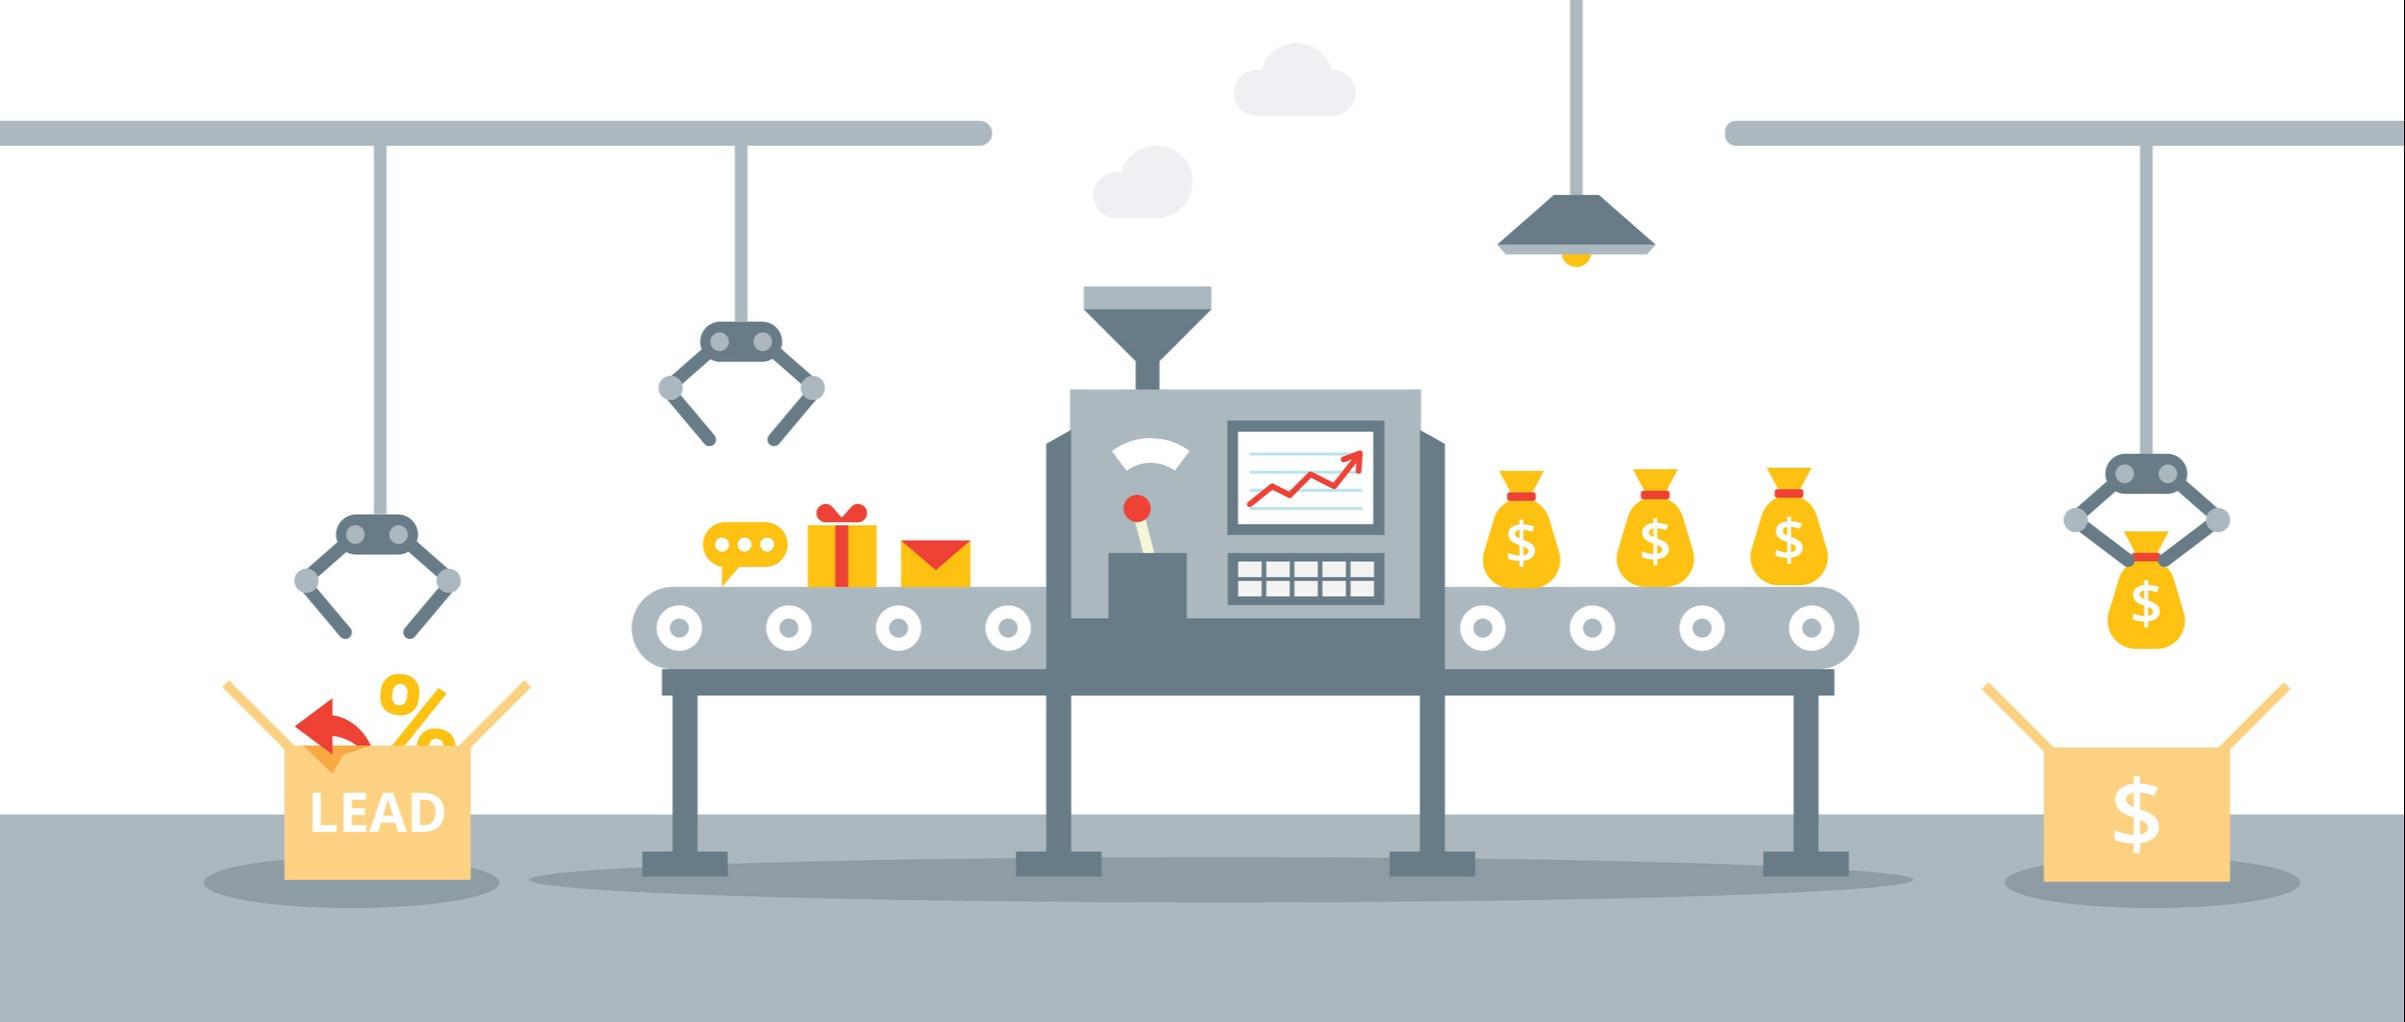 marketing-automation-lead-generation